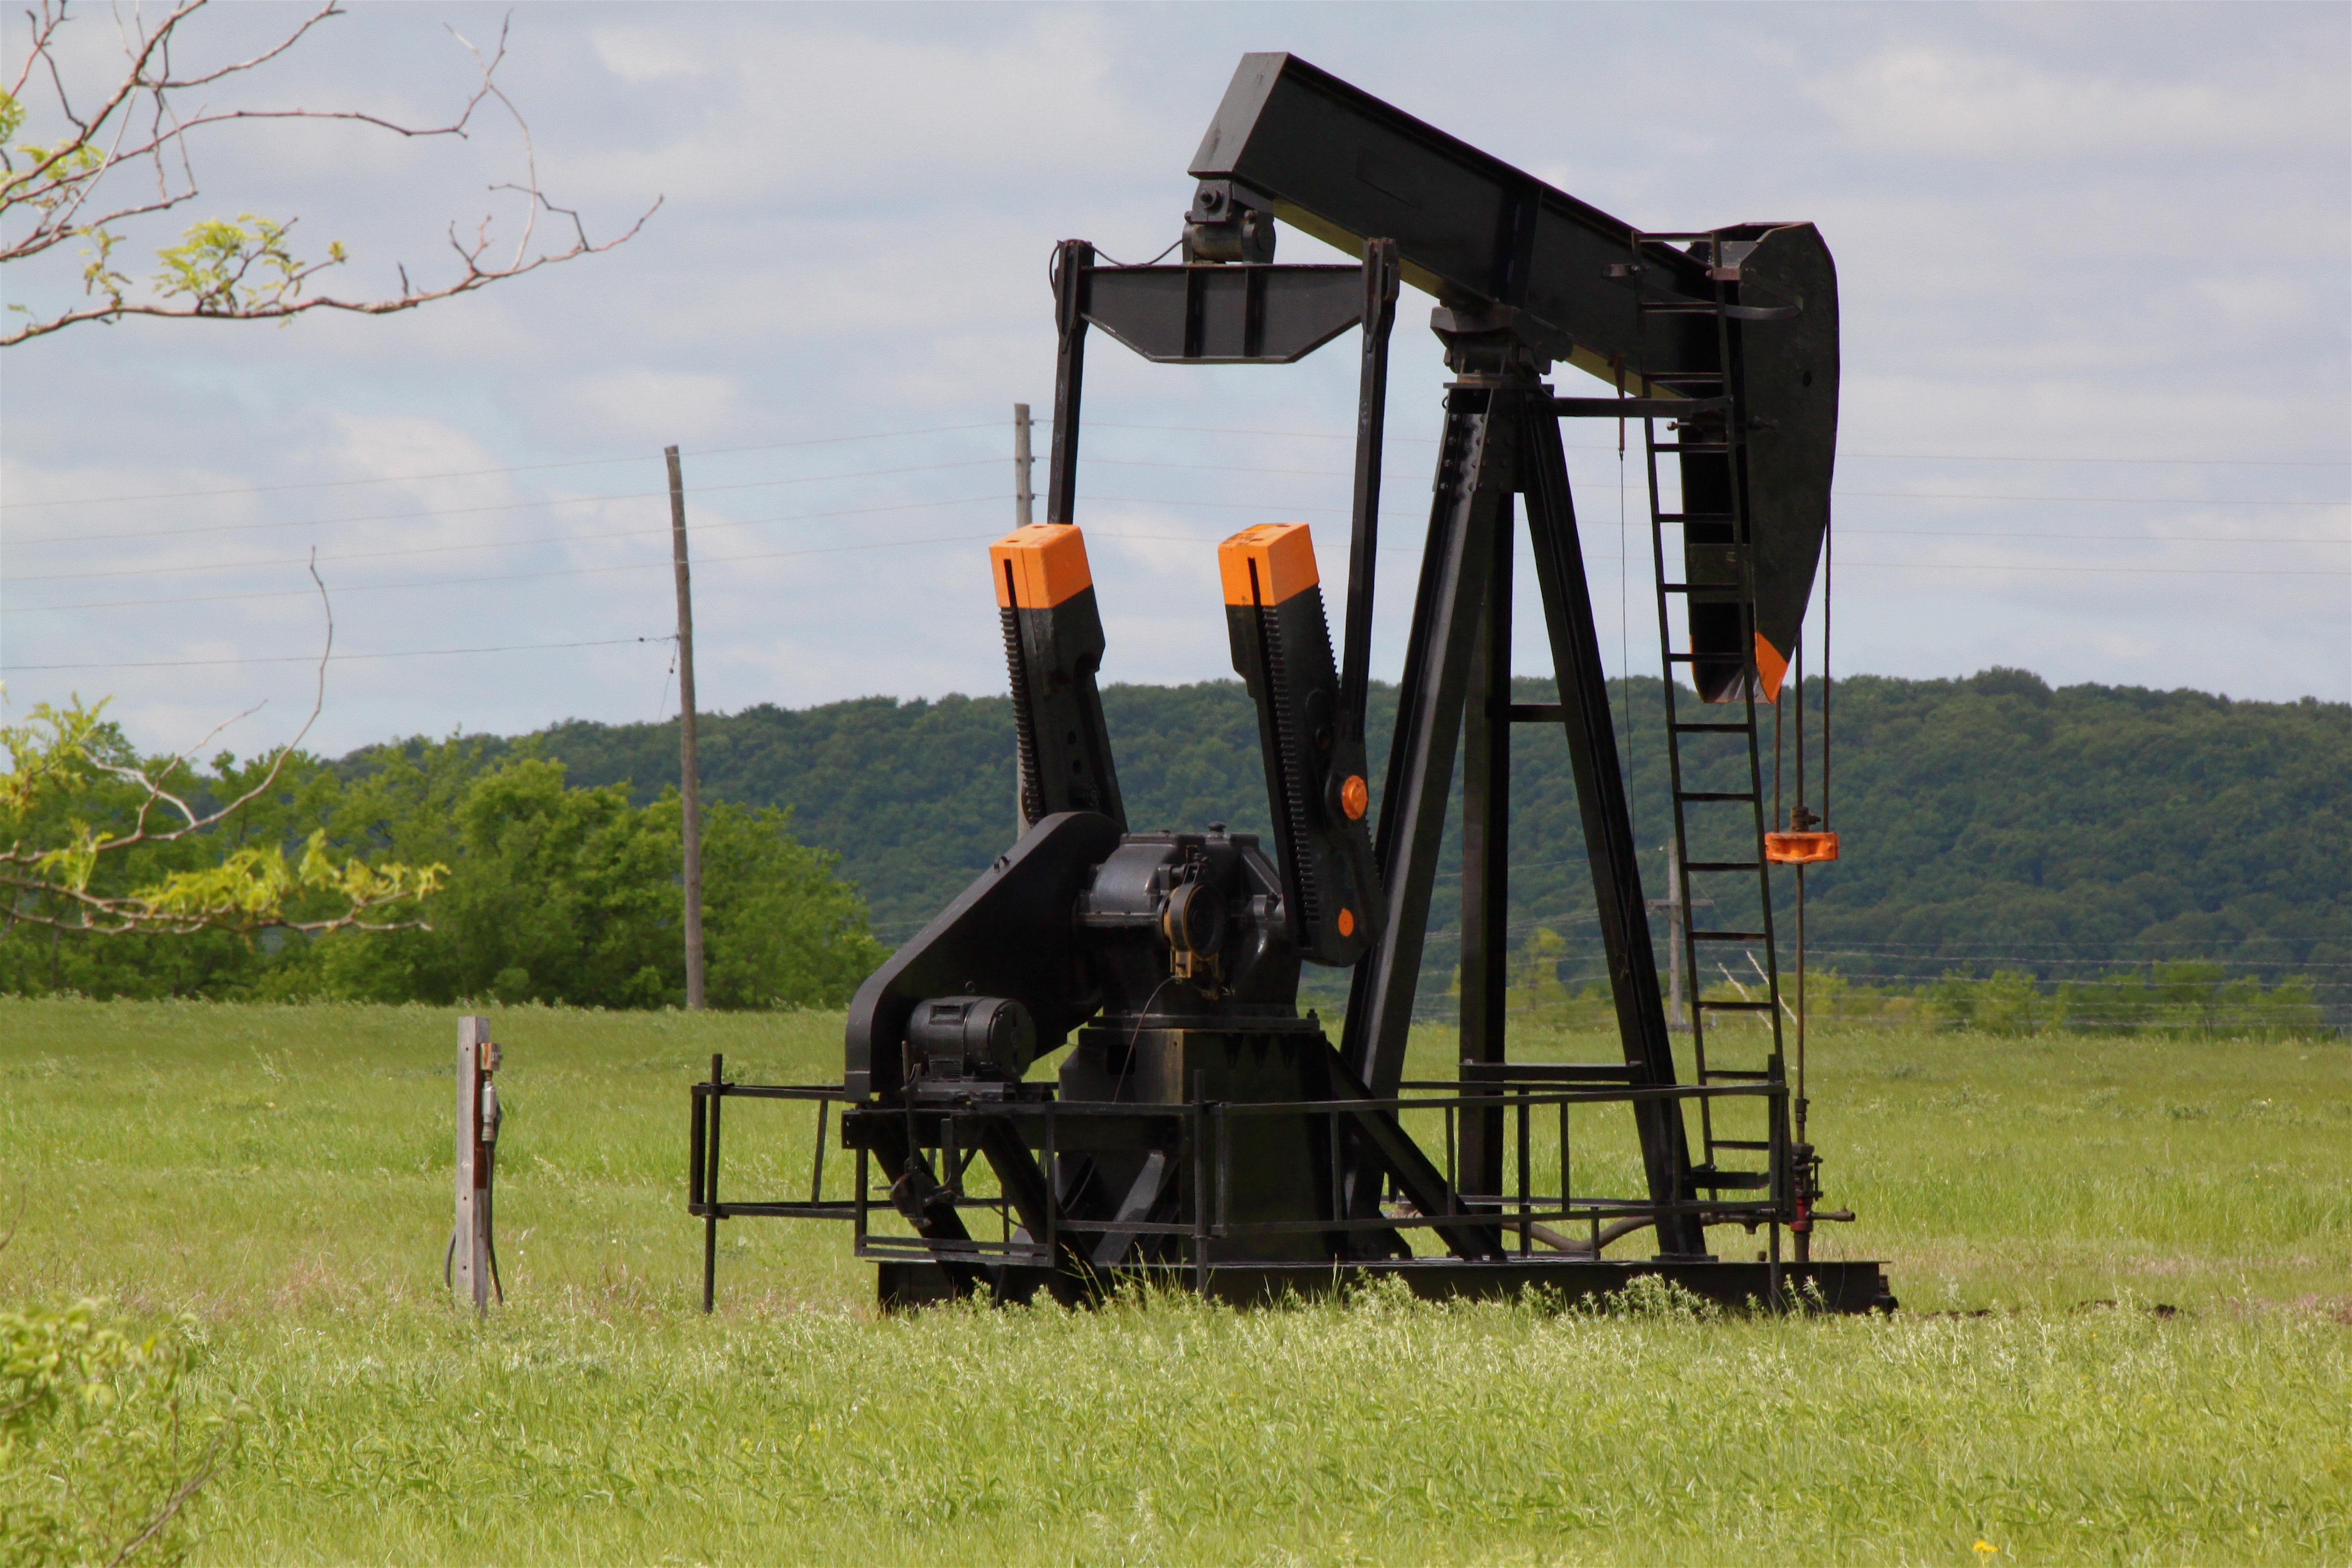 dating oil field worker ¡mira beefy muscle str8 oil field worker en xhamstercom xhamster es el mejor tubo de sexo para porno gratis.